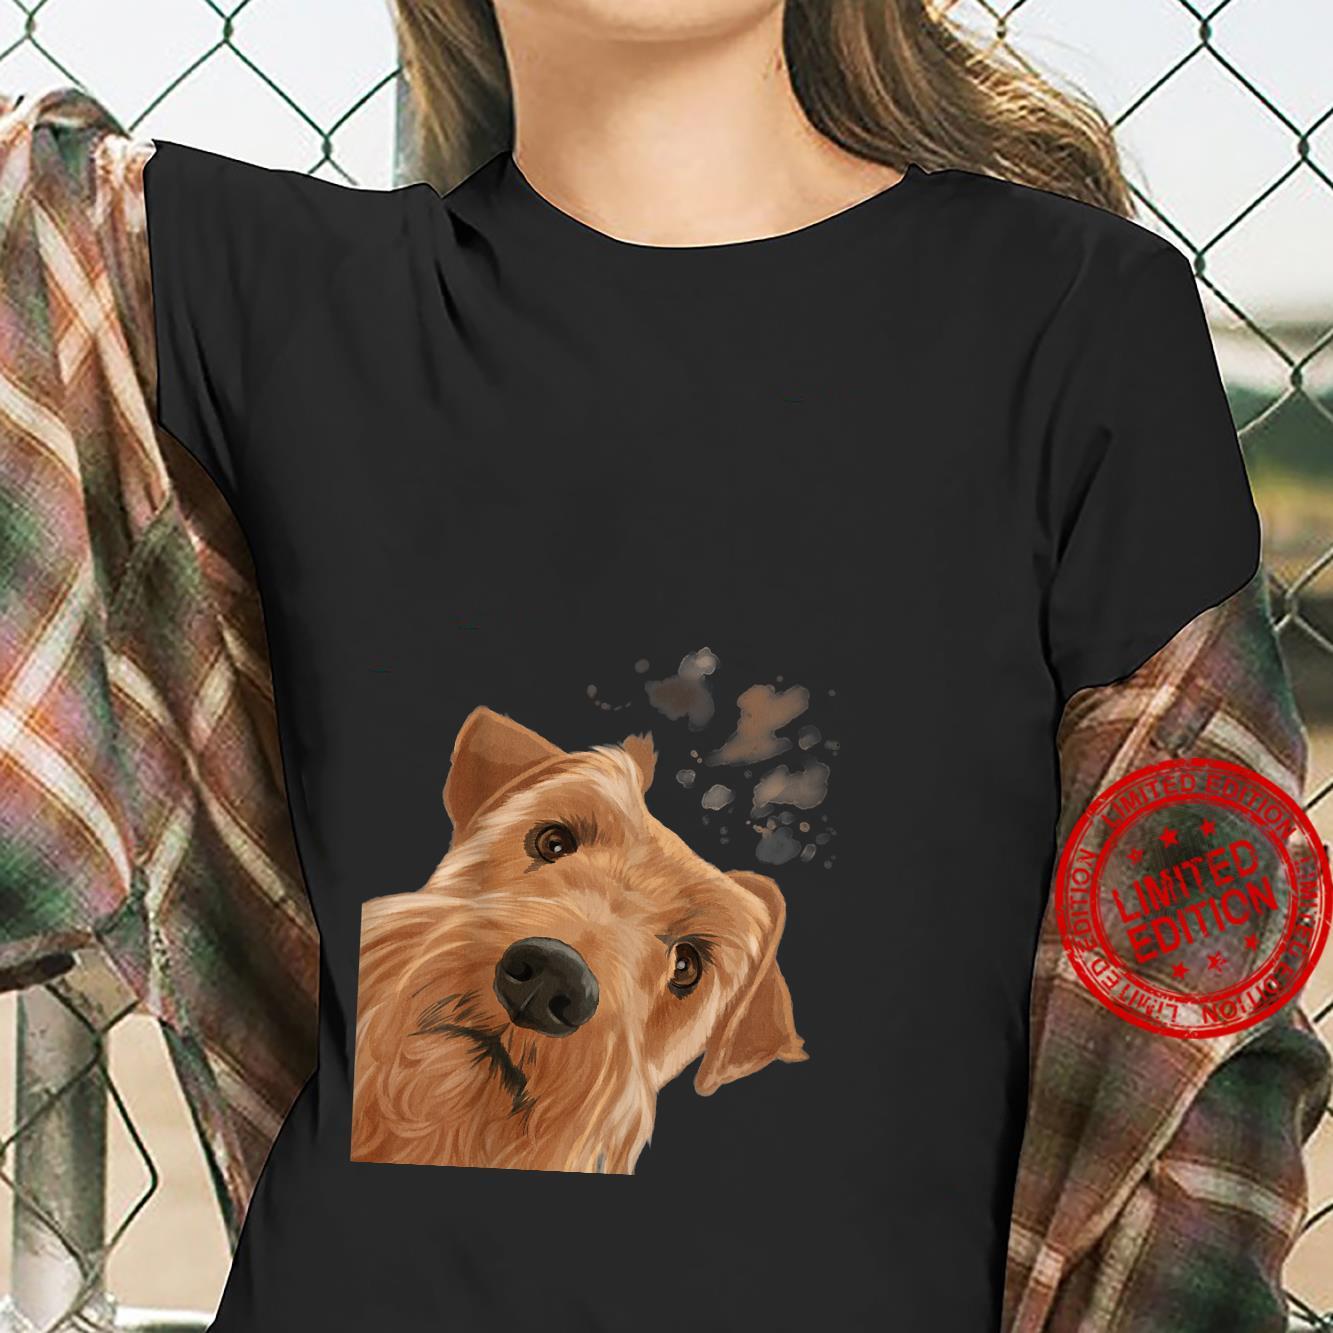 Funny Curious Dog Irish Terrier Shirt ladies tee